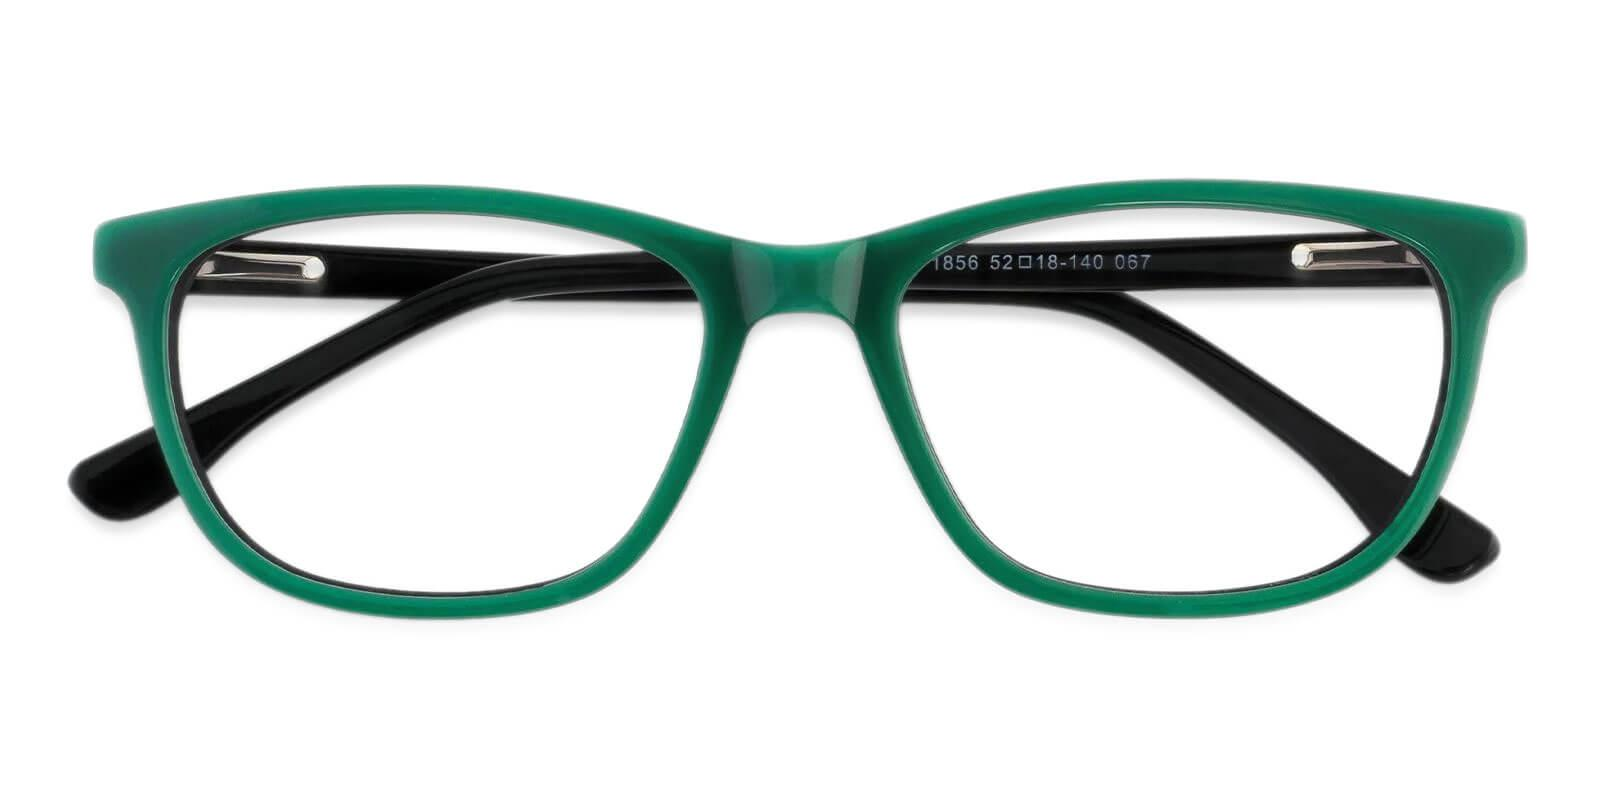 Machovec Green Acetate Eyeglasses , SpringHinges , UniversalBridgeFit Frames from ABBE Glasses